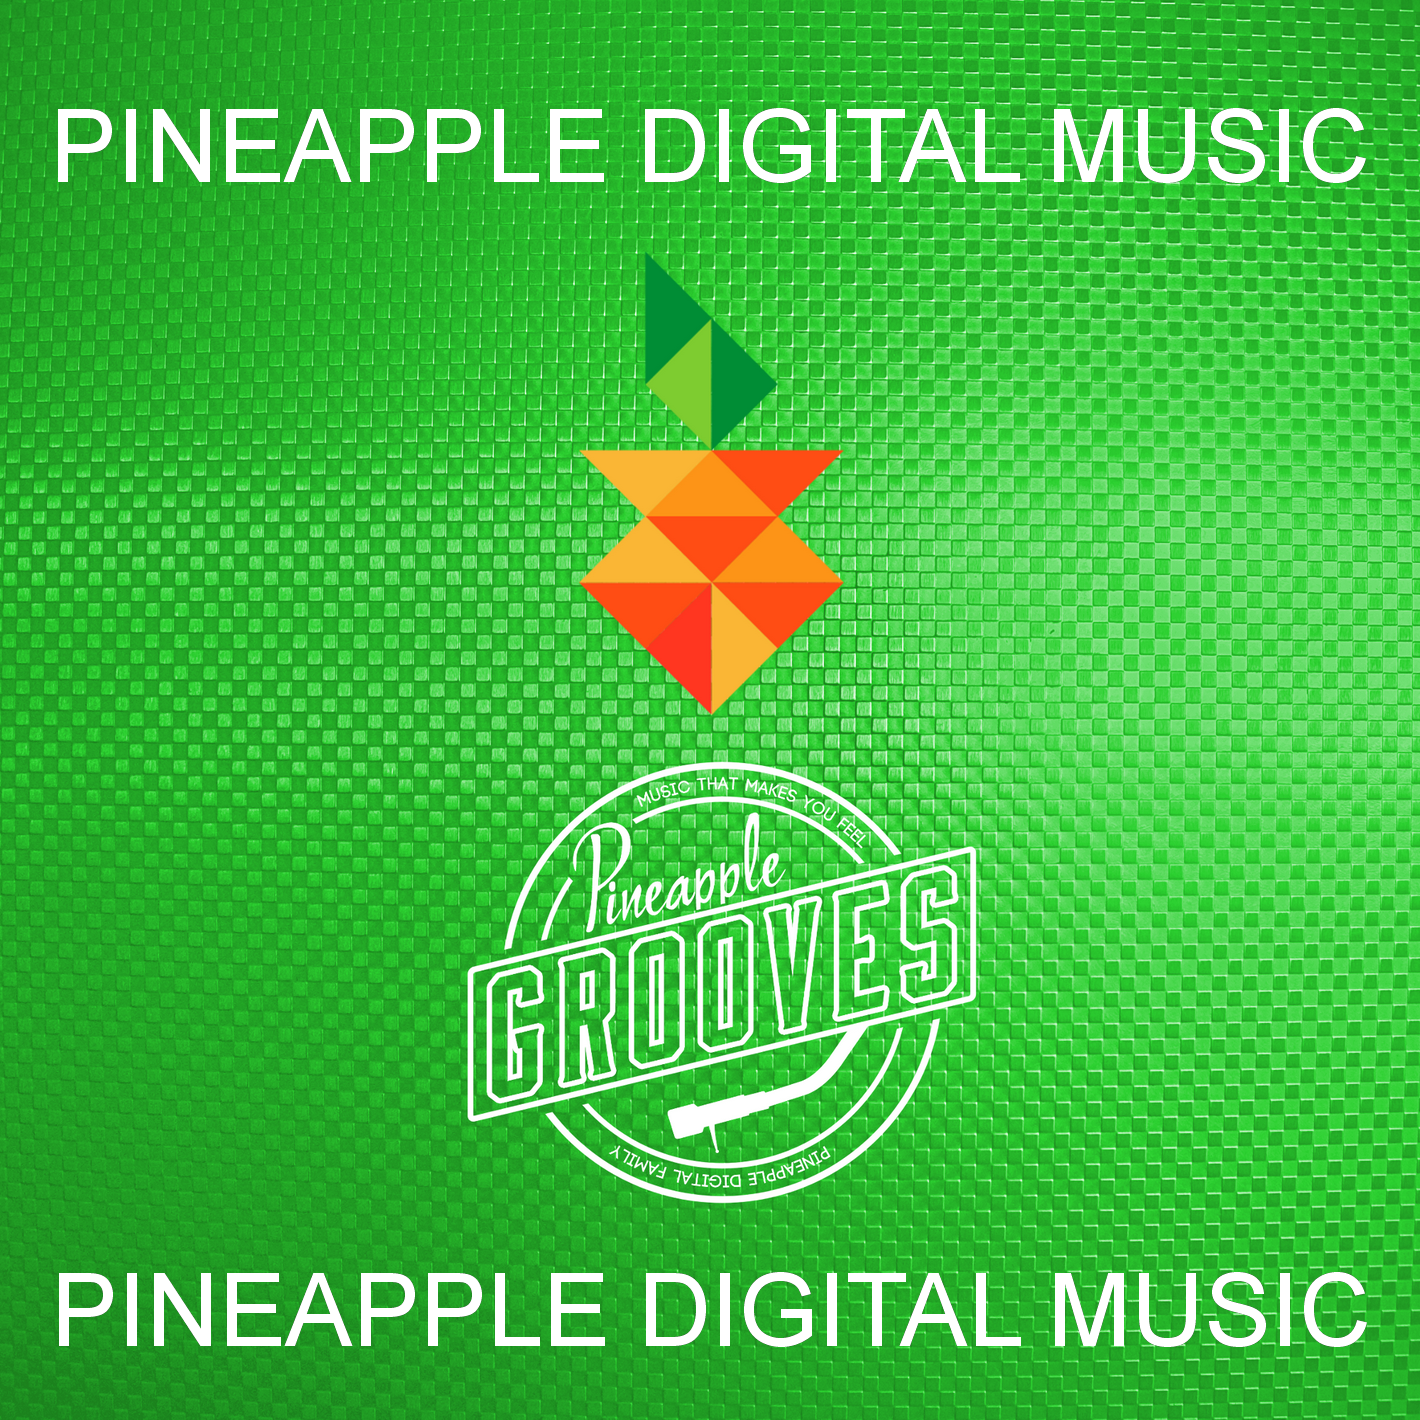 Pineapple Digital Music